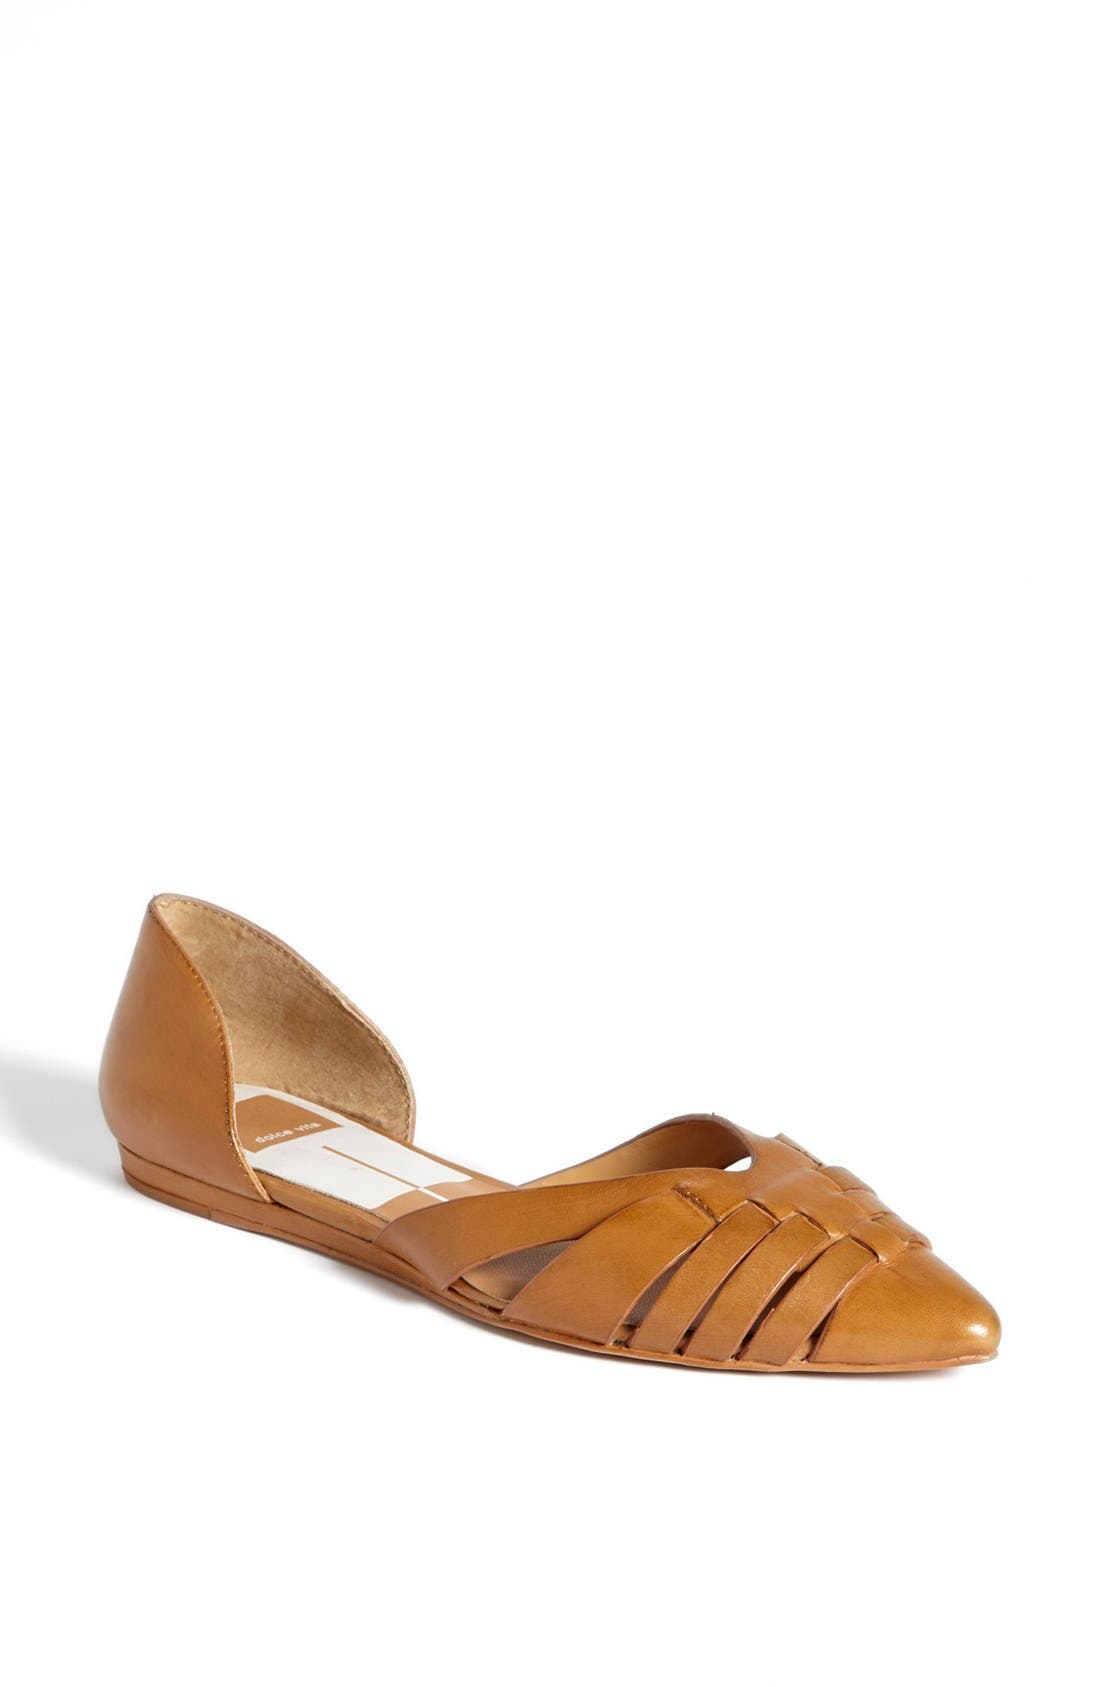 Alternate Image 1 Selected - Dolce Vita 'Alpha' Leather Flat Sandal